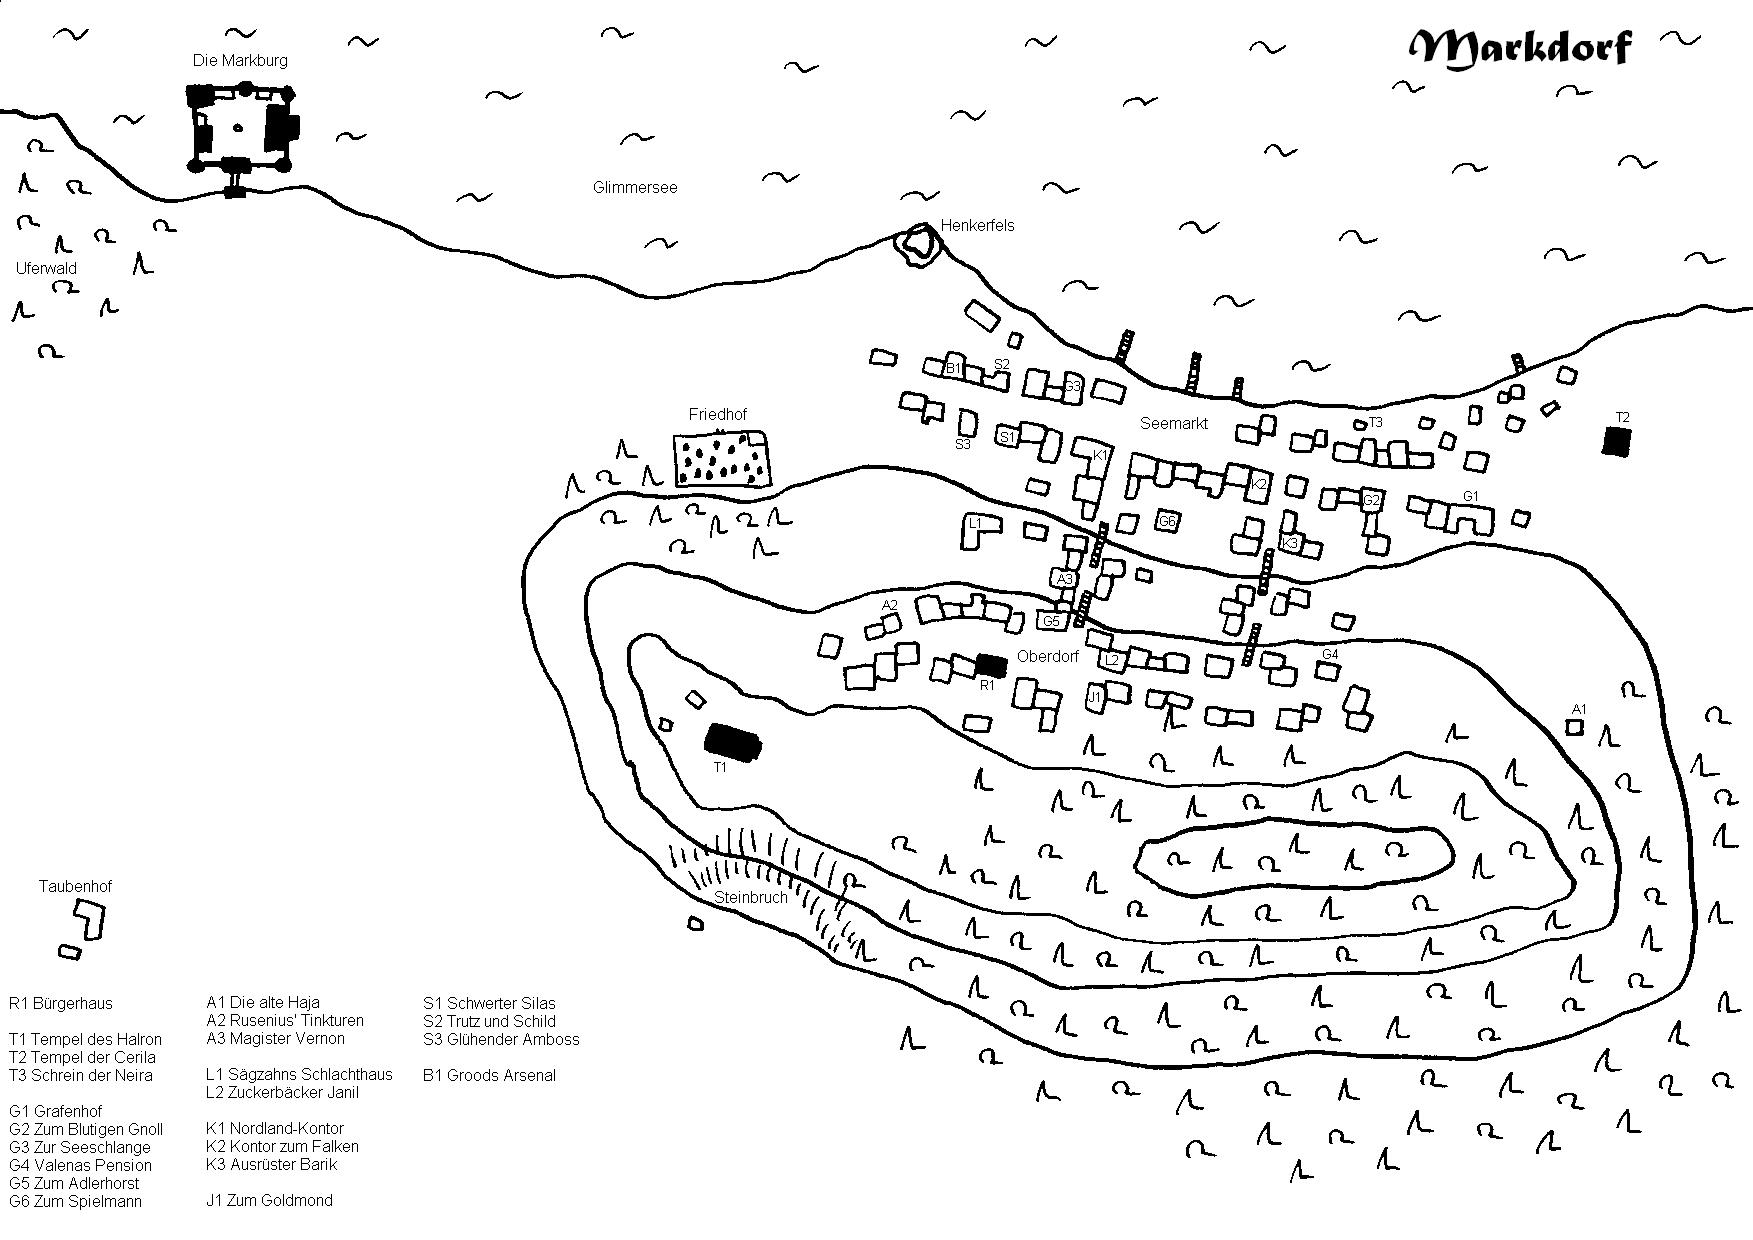 Markdorfkarte